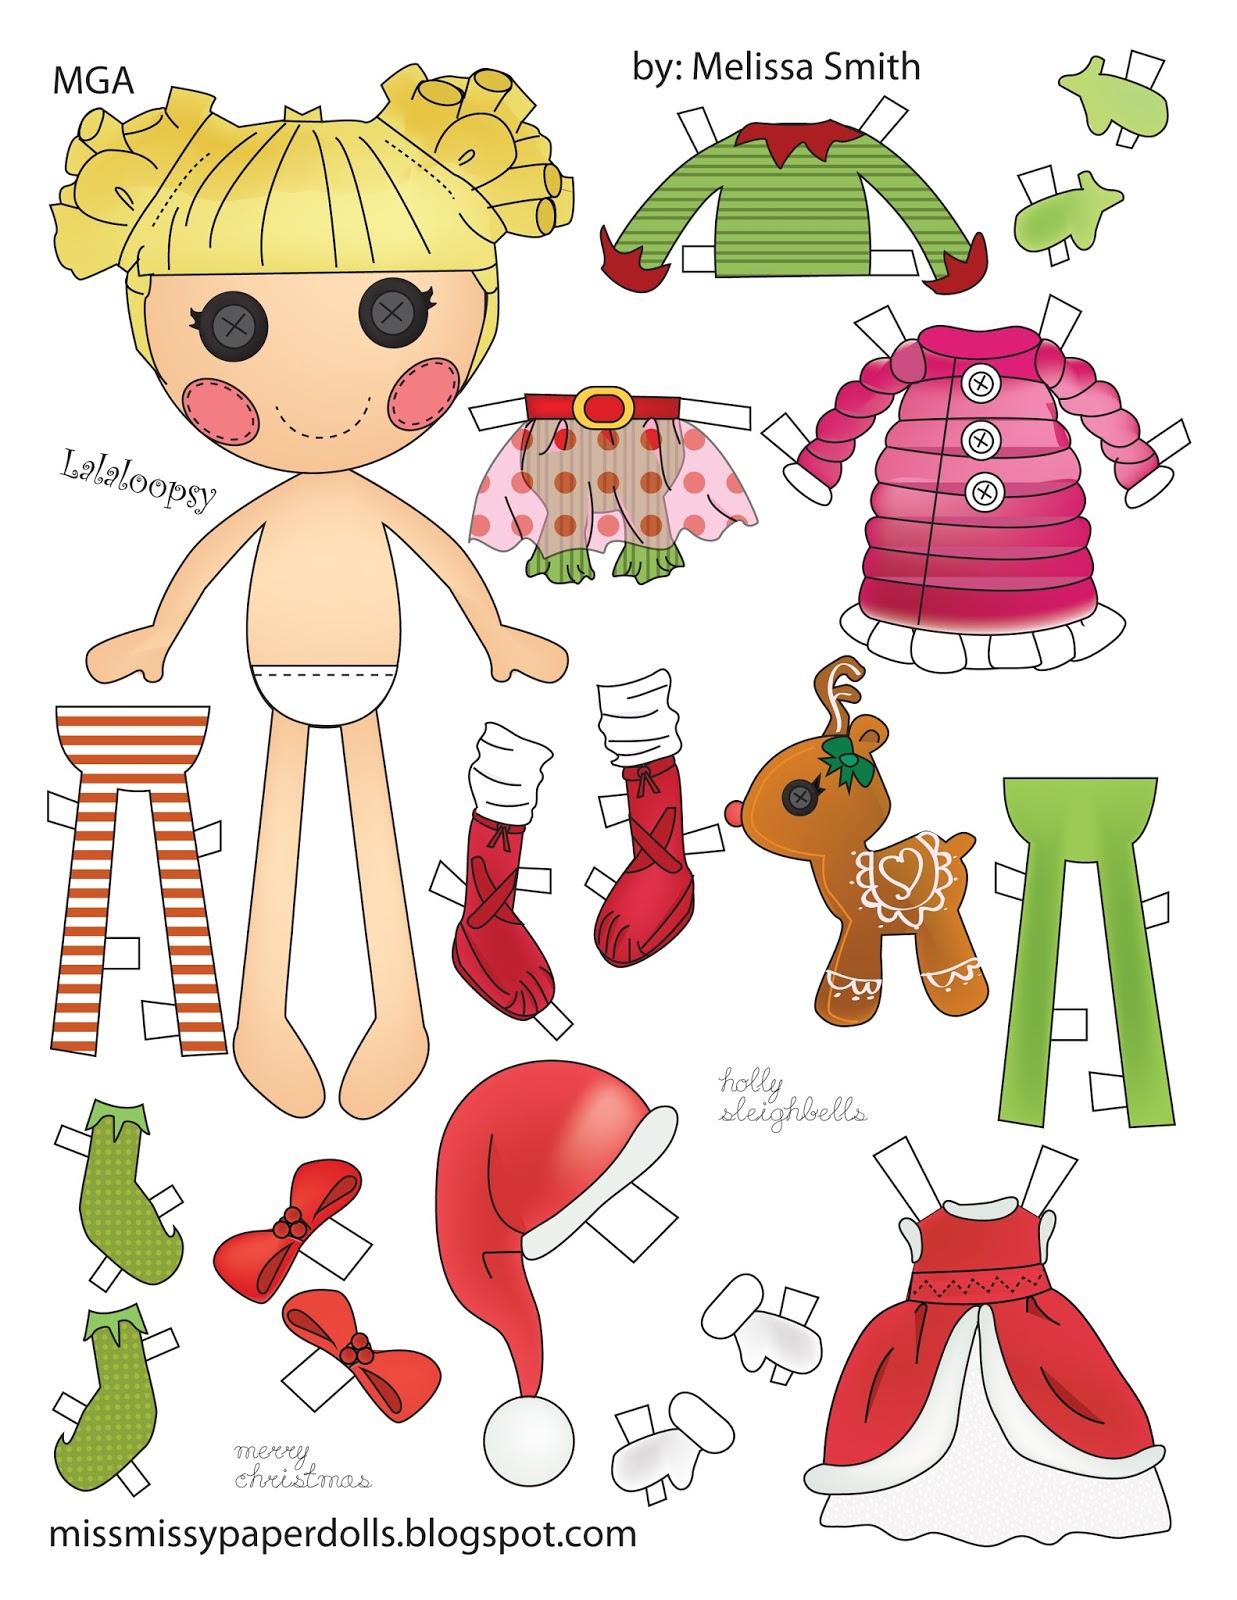 Miss Missy Paper Dolls Holly Sleighbells